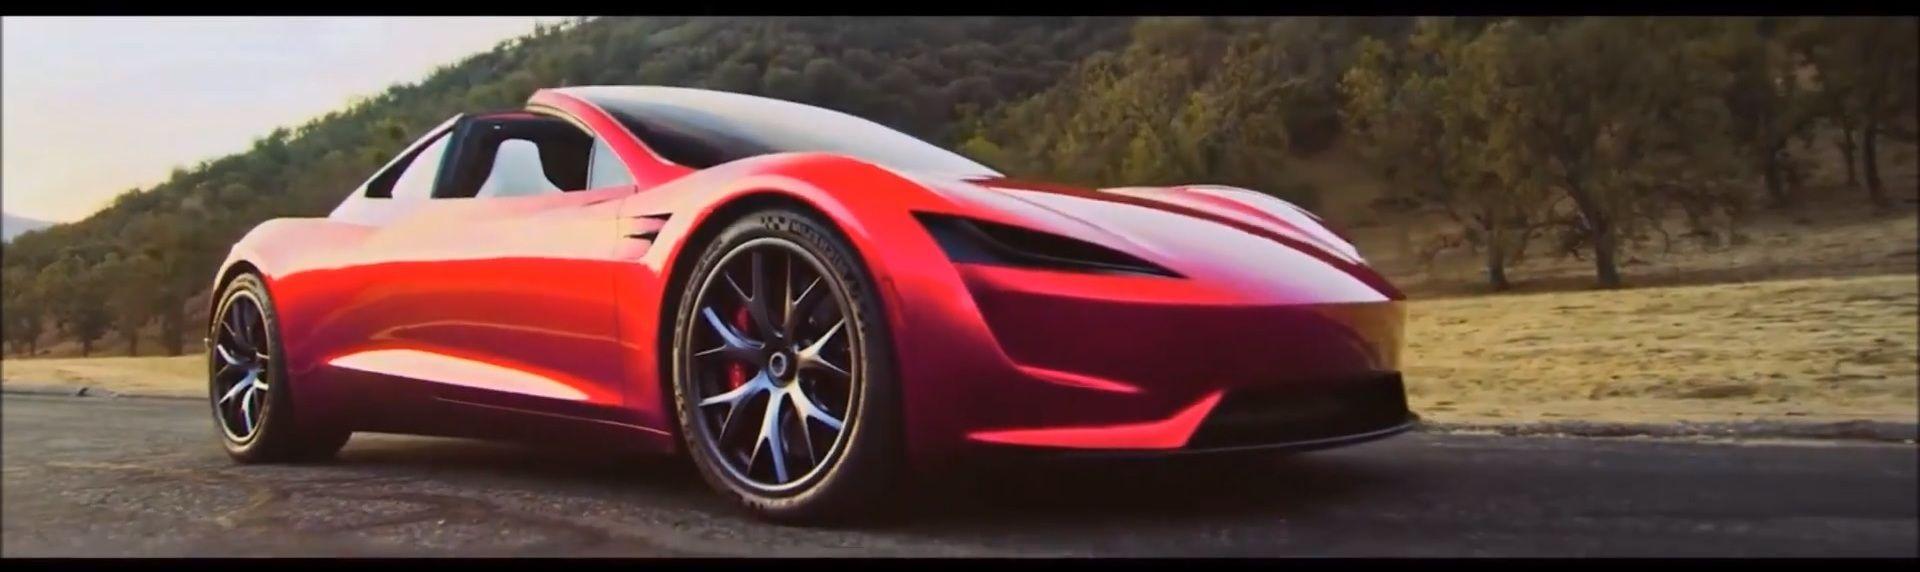 New Tesla Roadster Supercar Comparison New Tesla Roadster Tesla Roadster Roadsters